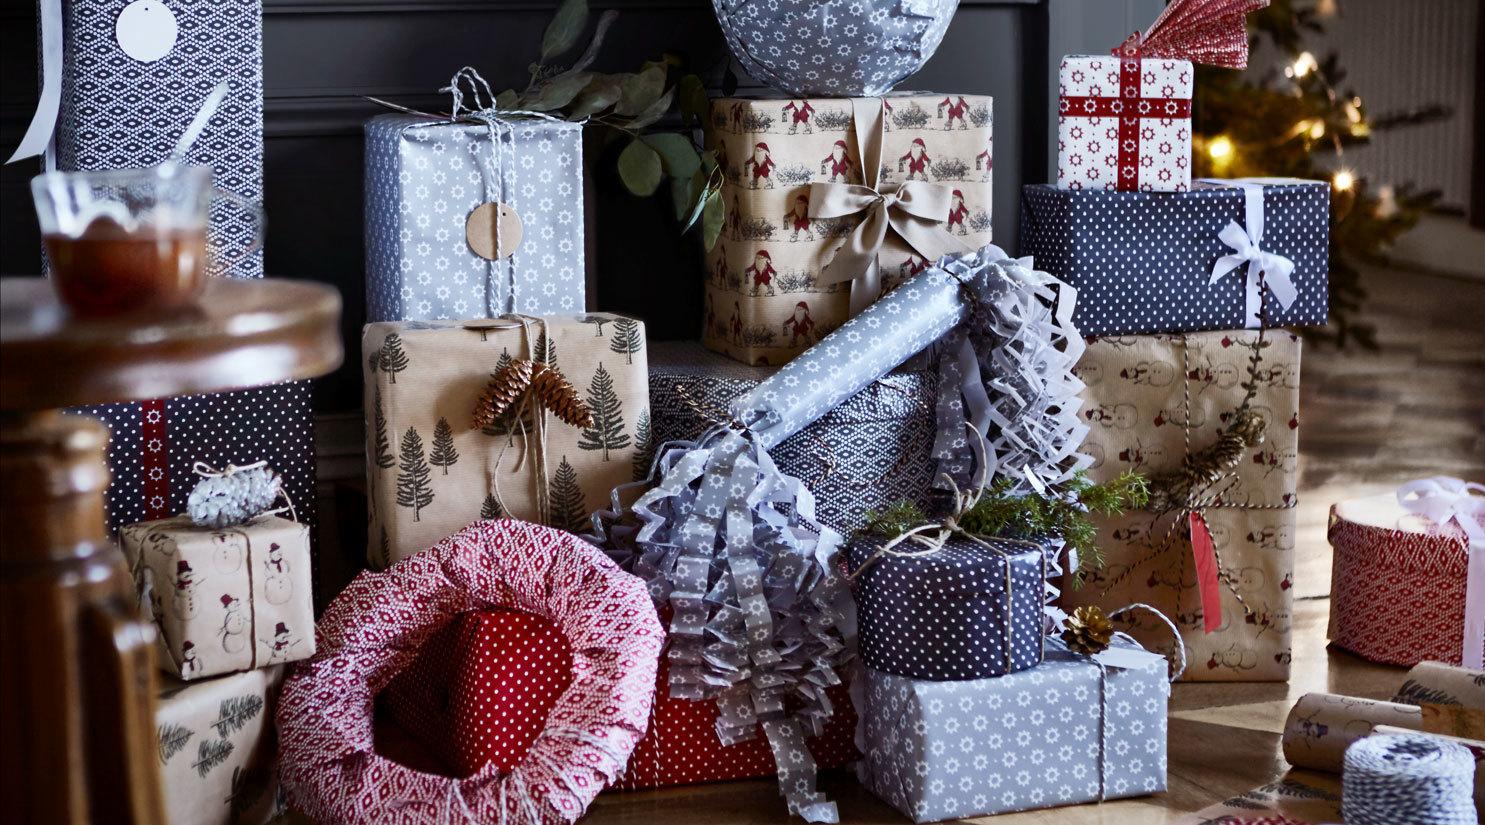 gua de regalos de navidad ms de ideas infalibles